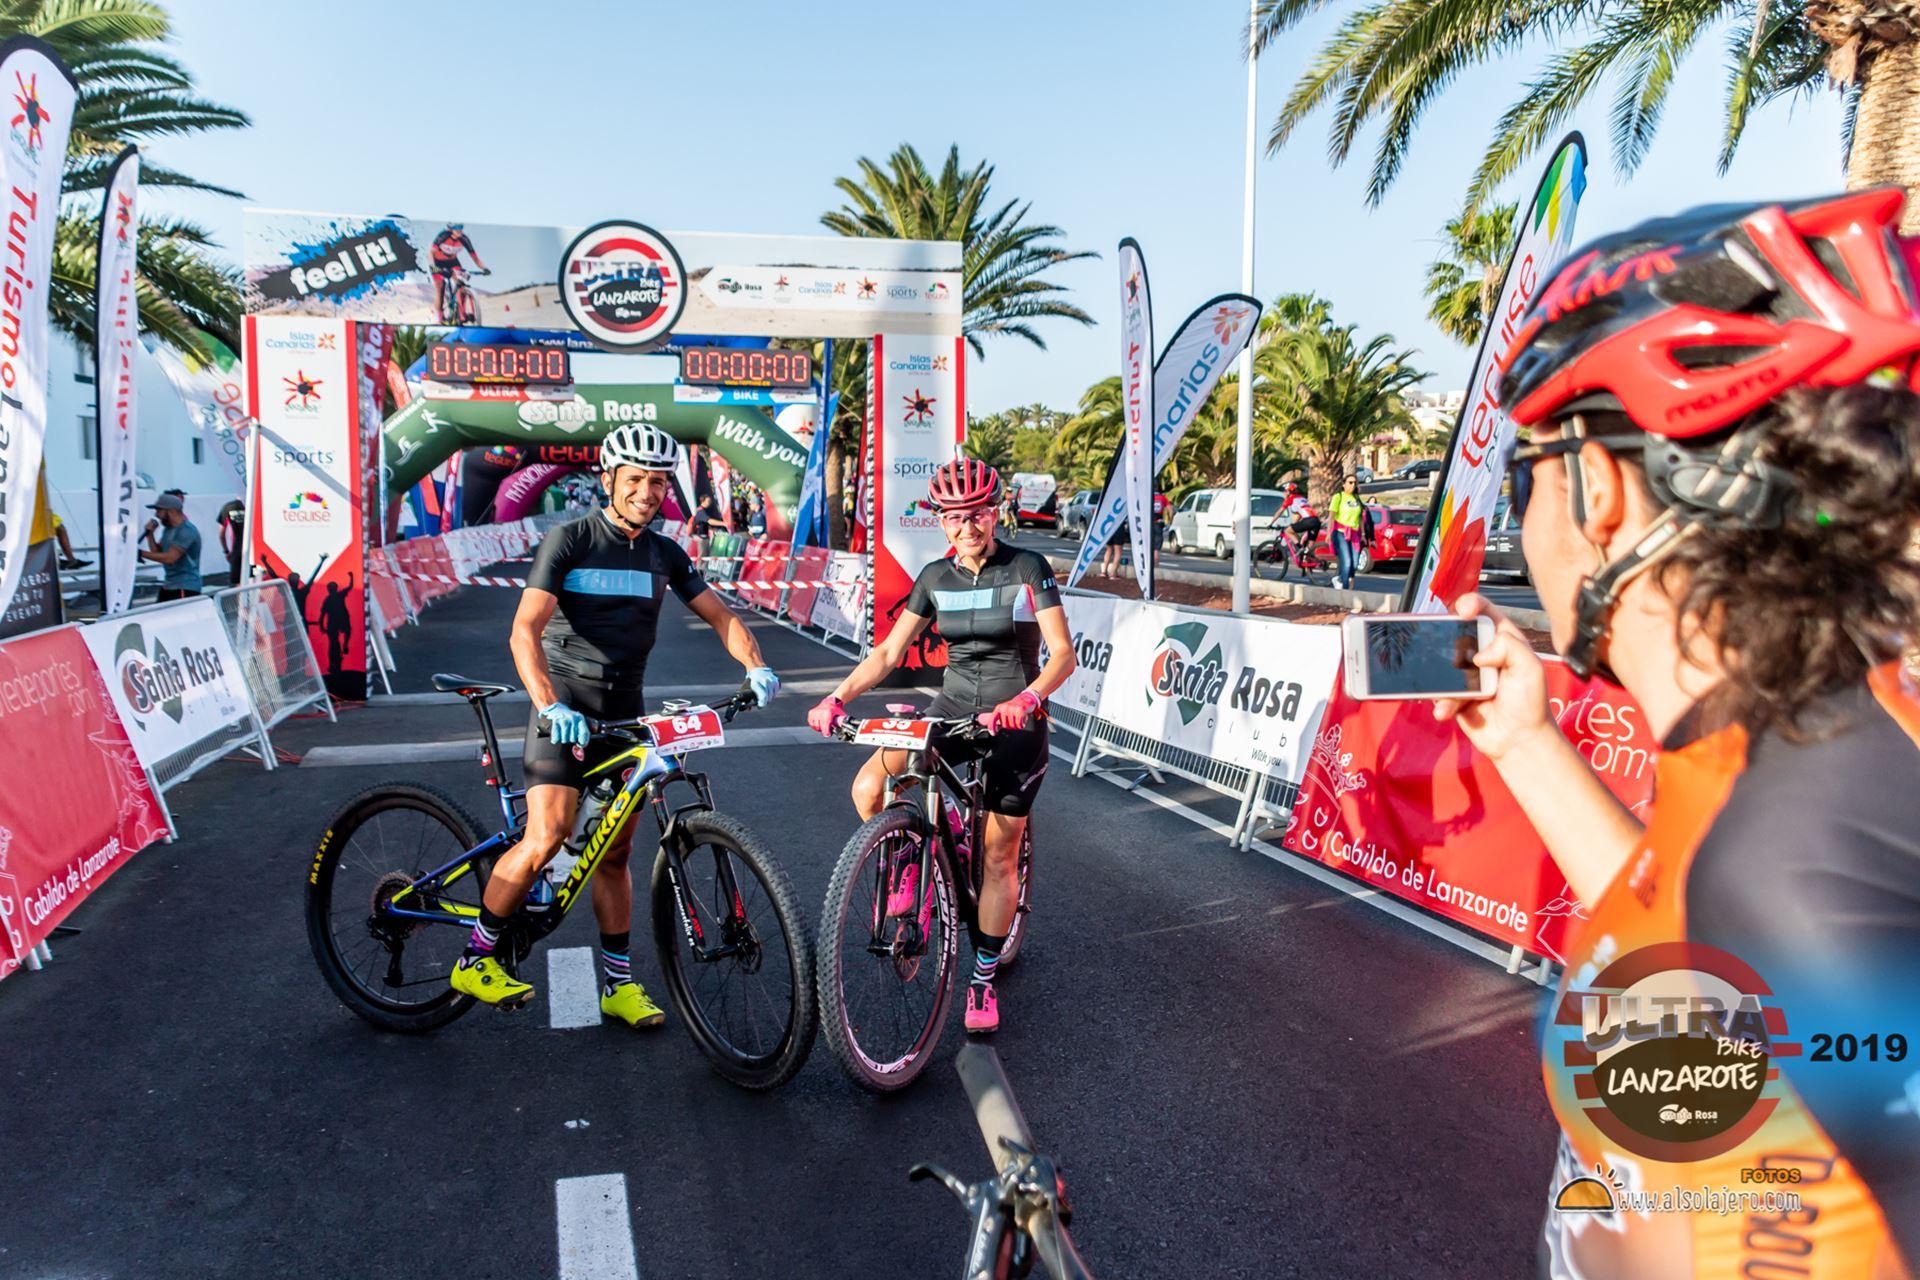 Salida 2ª Etapa Ultrabike 2019 Fotos Alsolajero.com-7